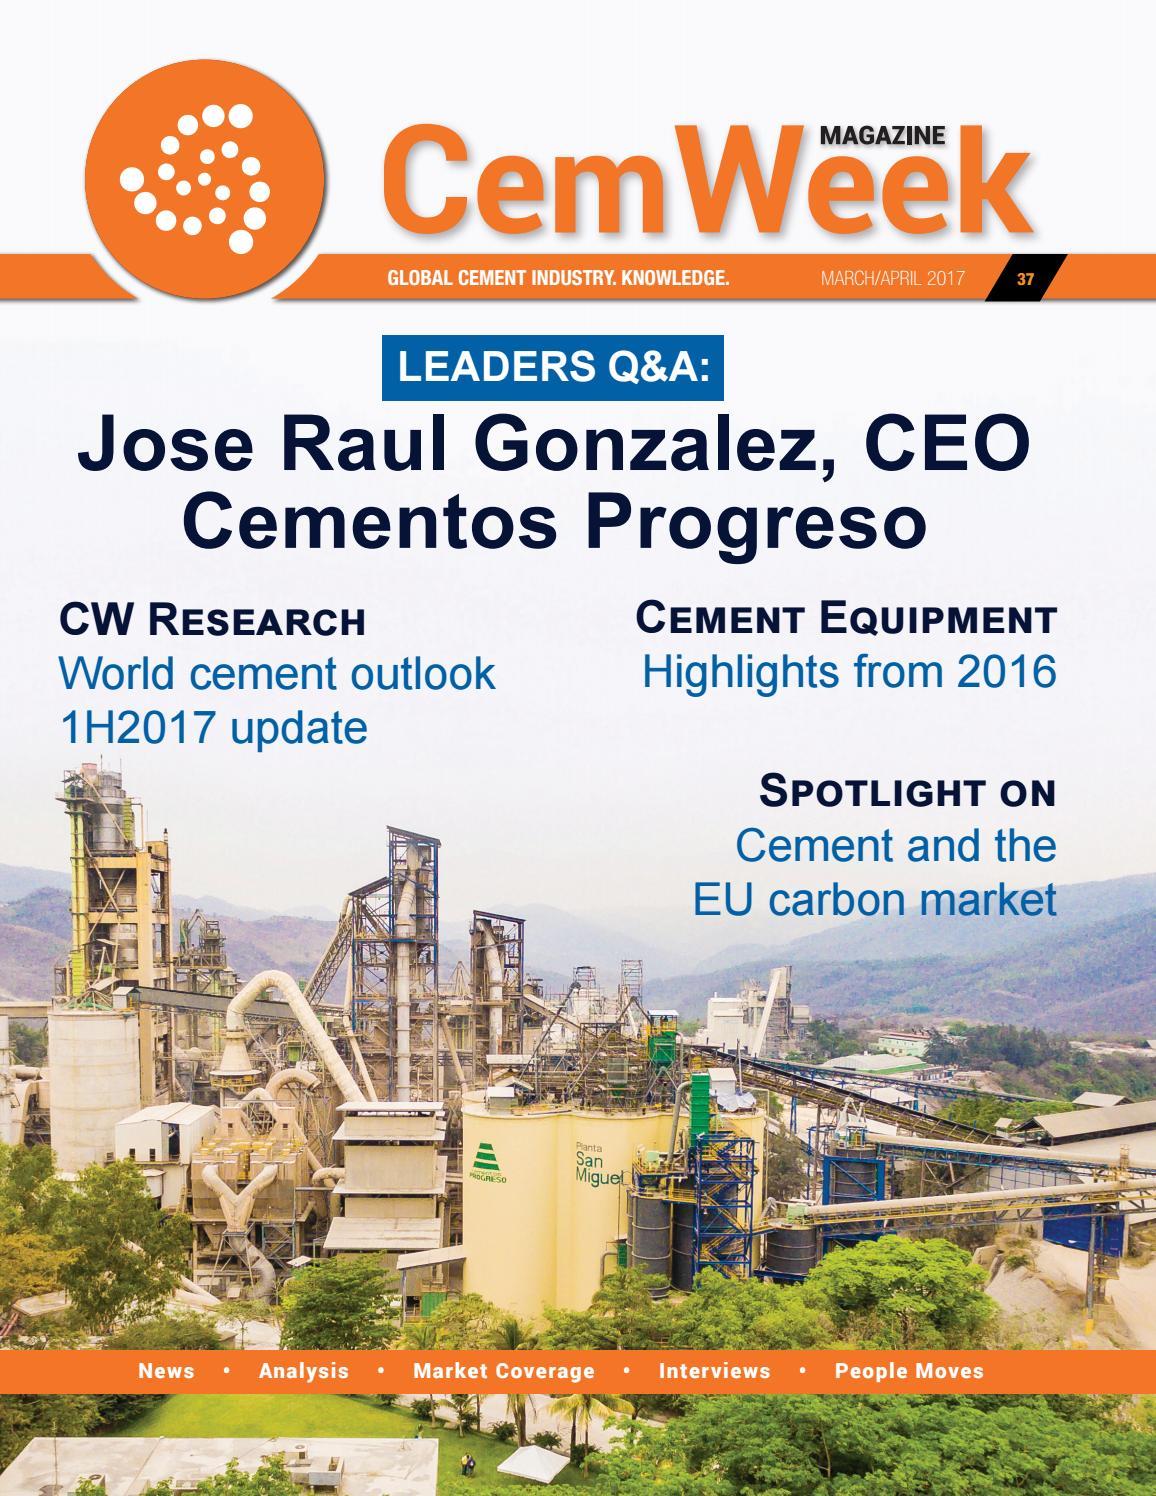 CemWeek Magazine: March/April 2017 by CemWeek - issuu